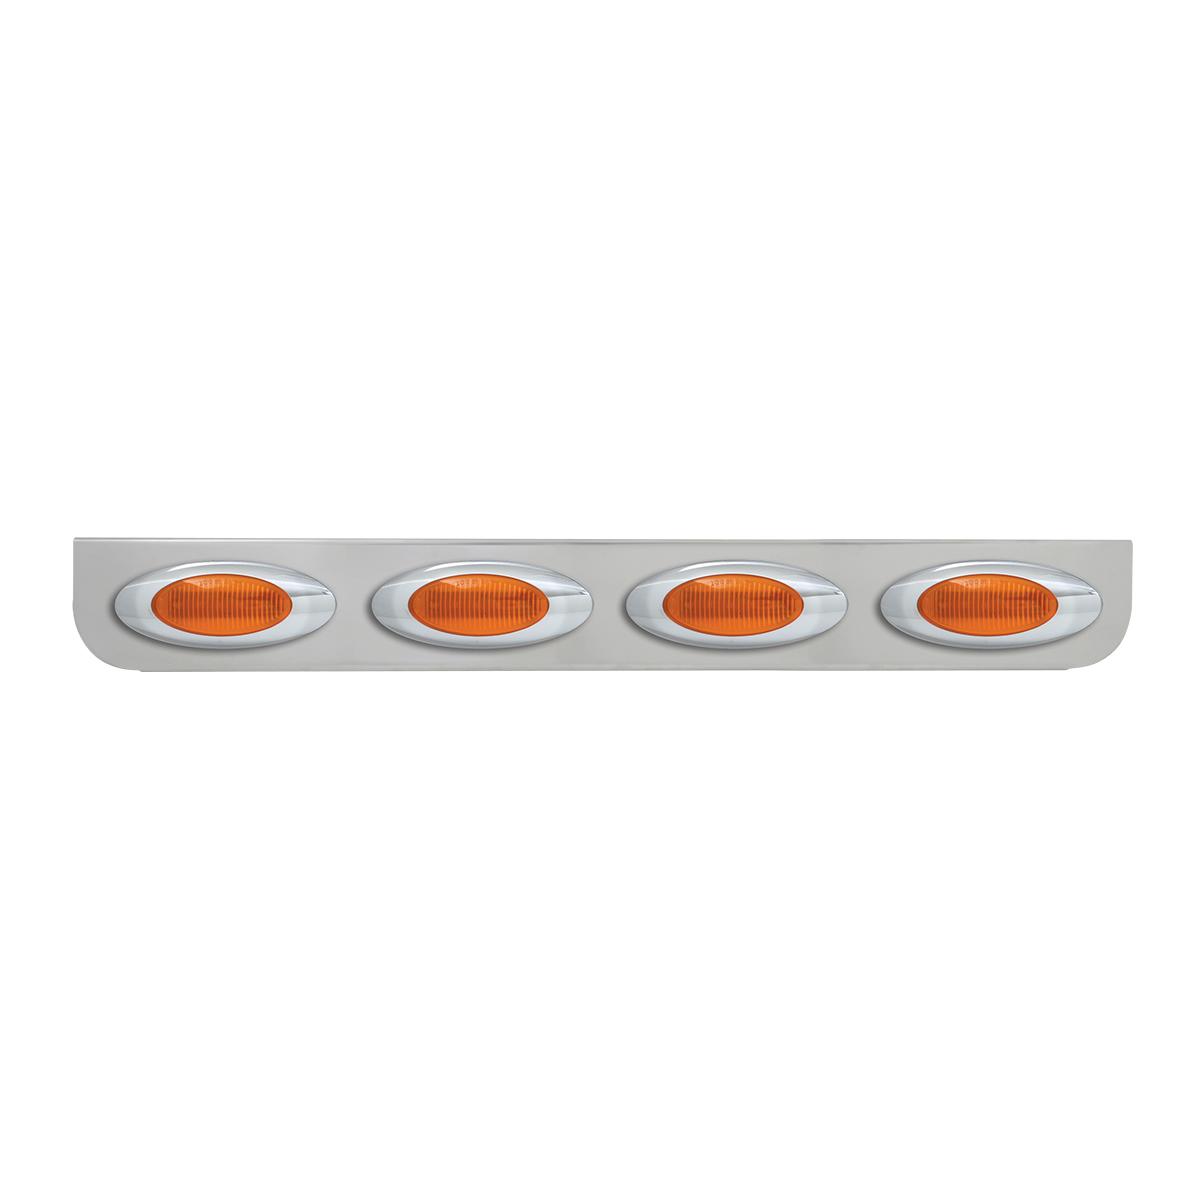 "#89070 Quadruple Chrome ""L"" Shape Light Bracket with Plug-In Y2K Incandescent Light"